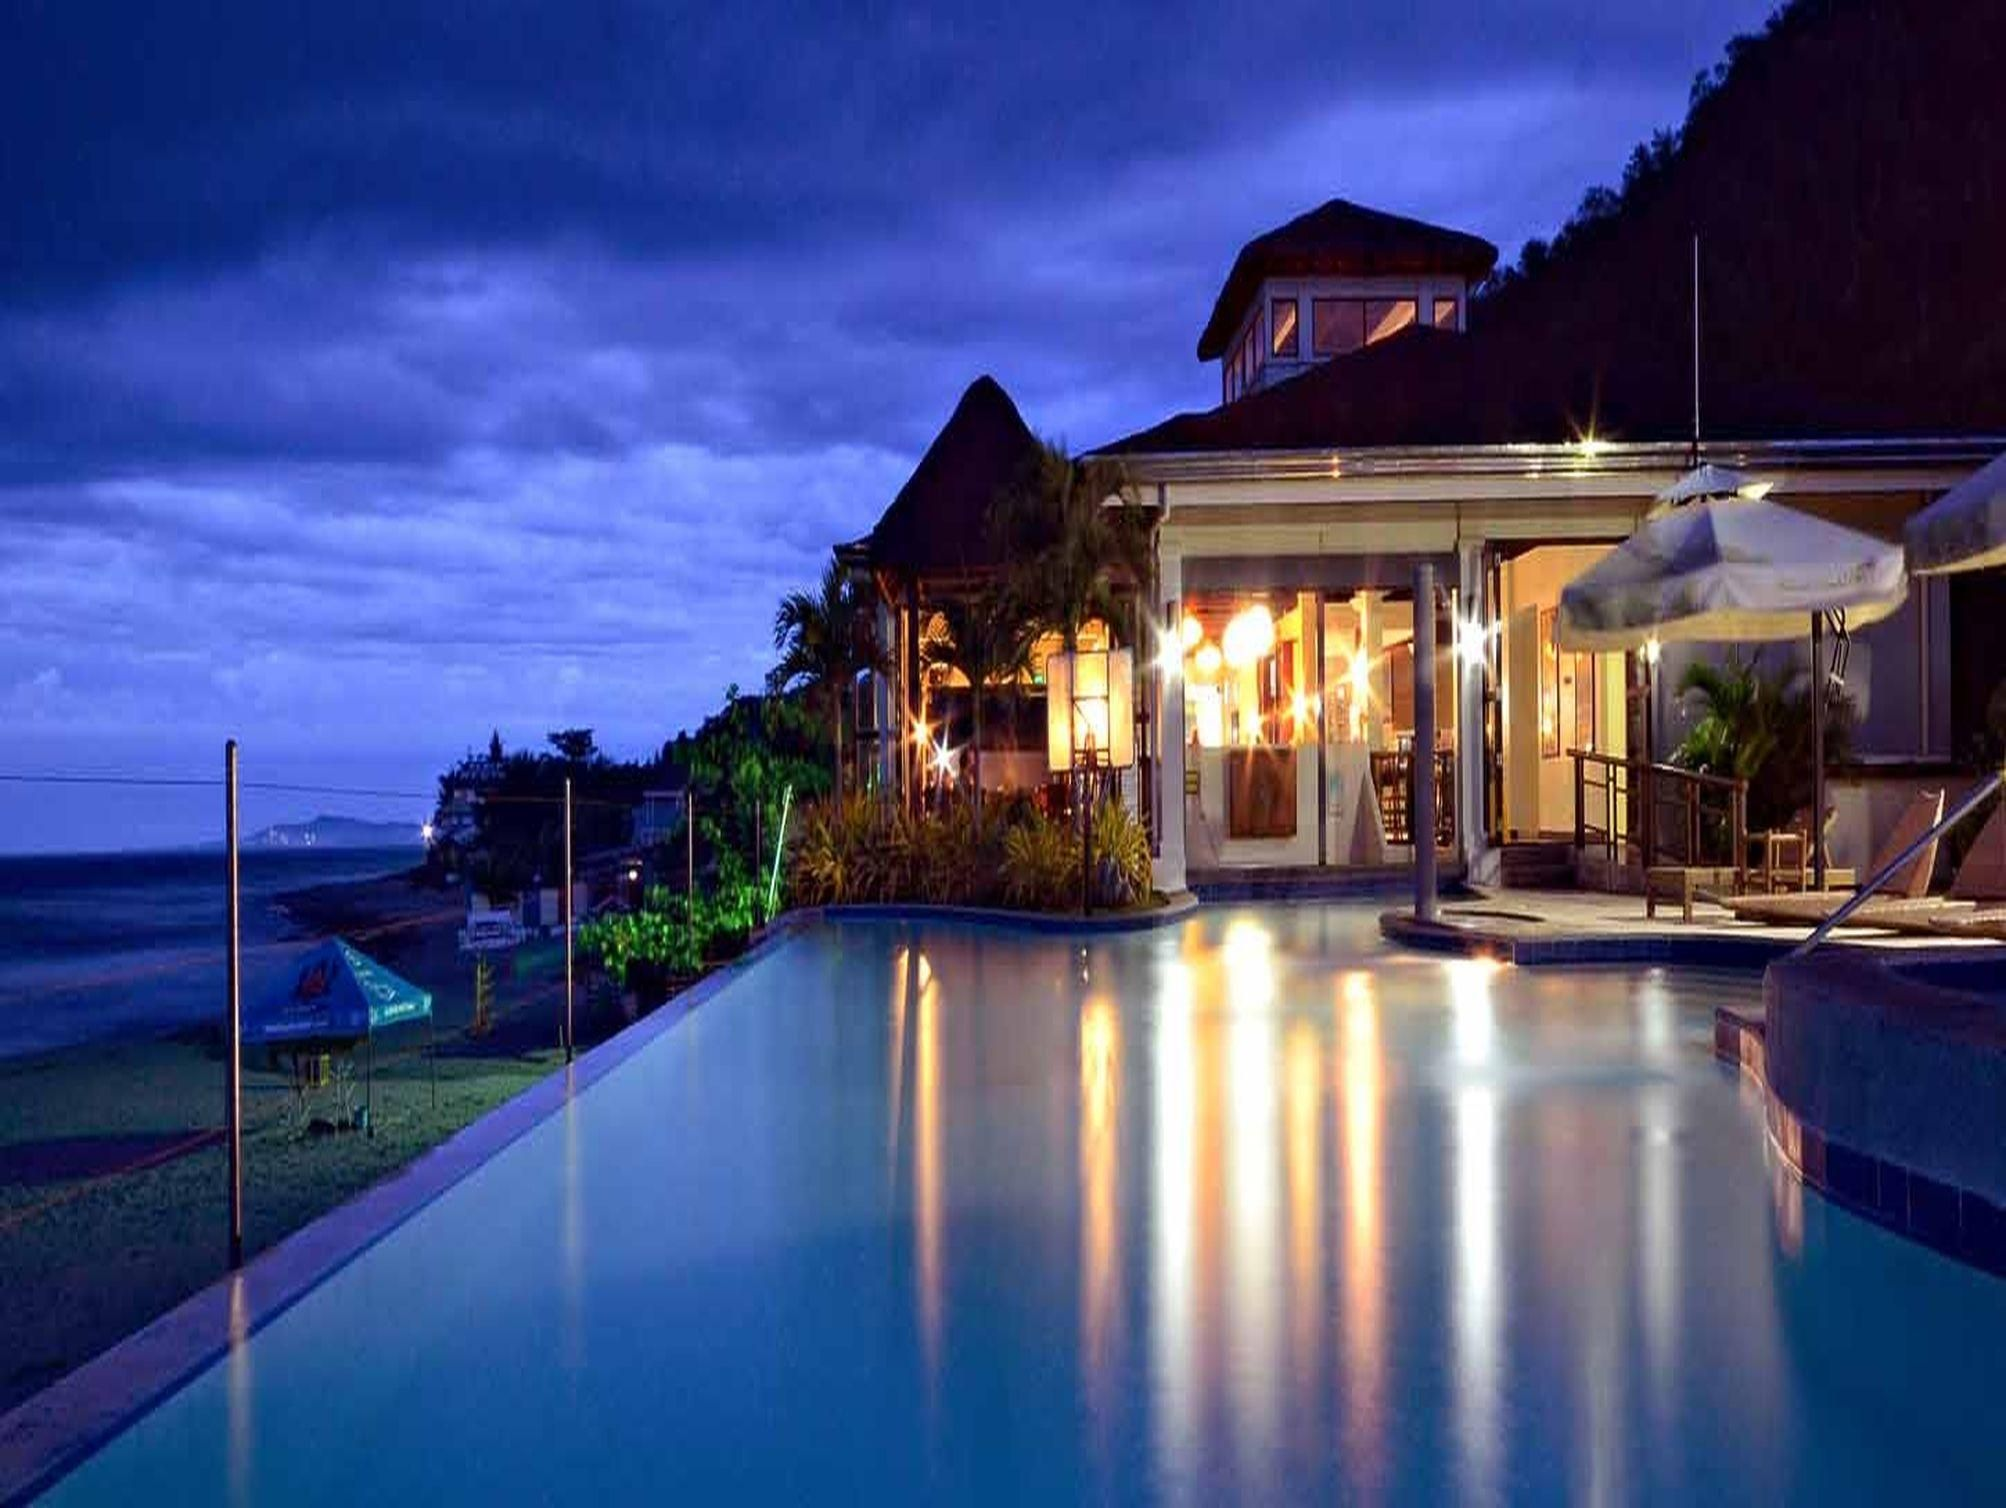 La Union Kahuna Beach Resort And Spa Philippines Asia Kahuna Beach Resort And Spa Is Perfectly Located Kahuna Beach Resort La Union Philippines Beach Resorts